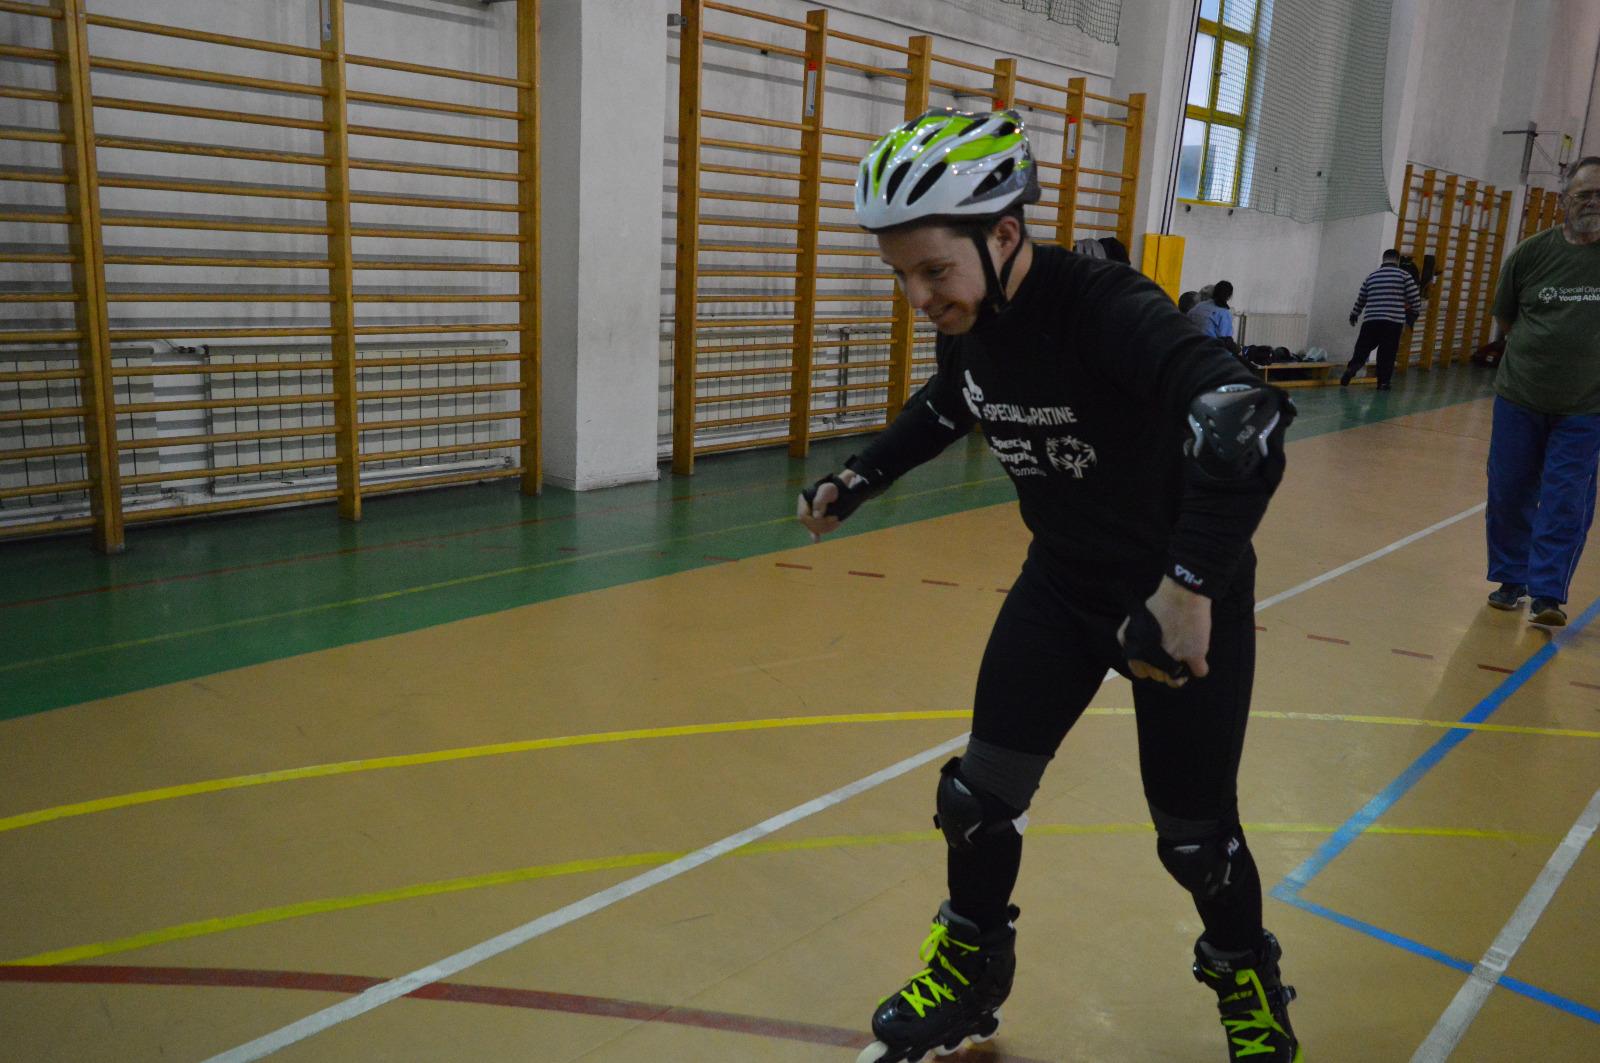 Special Olympics Romania, Speciali pe Patine, Cluj-Napoca (2) – Copy